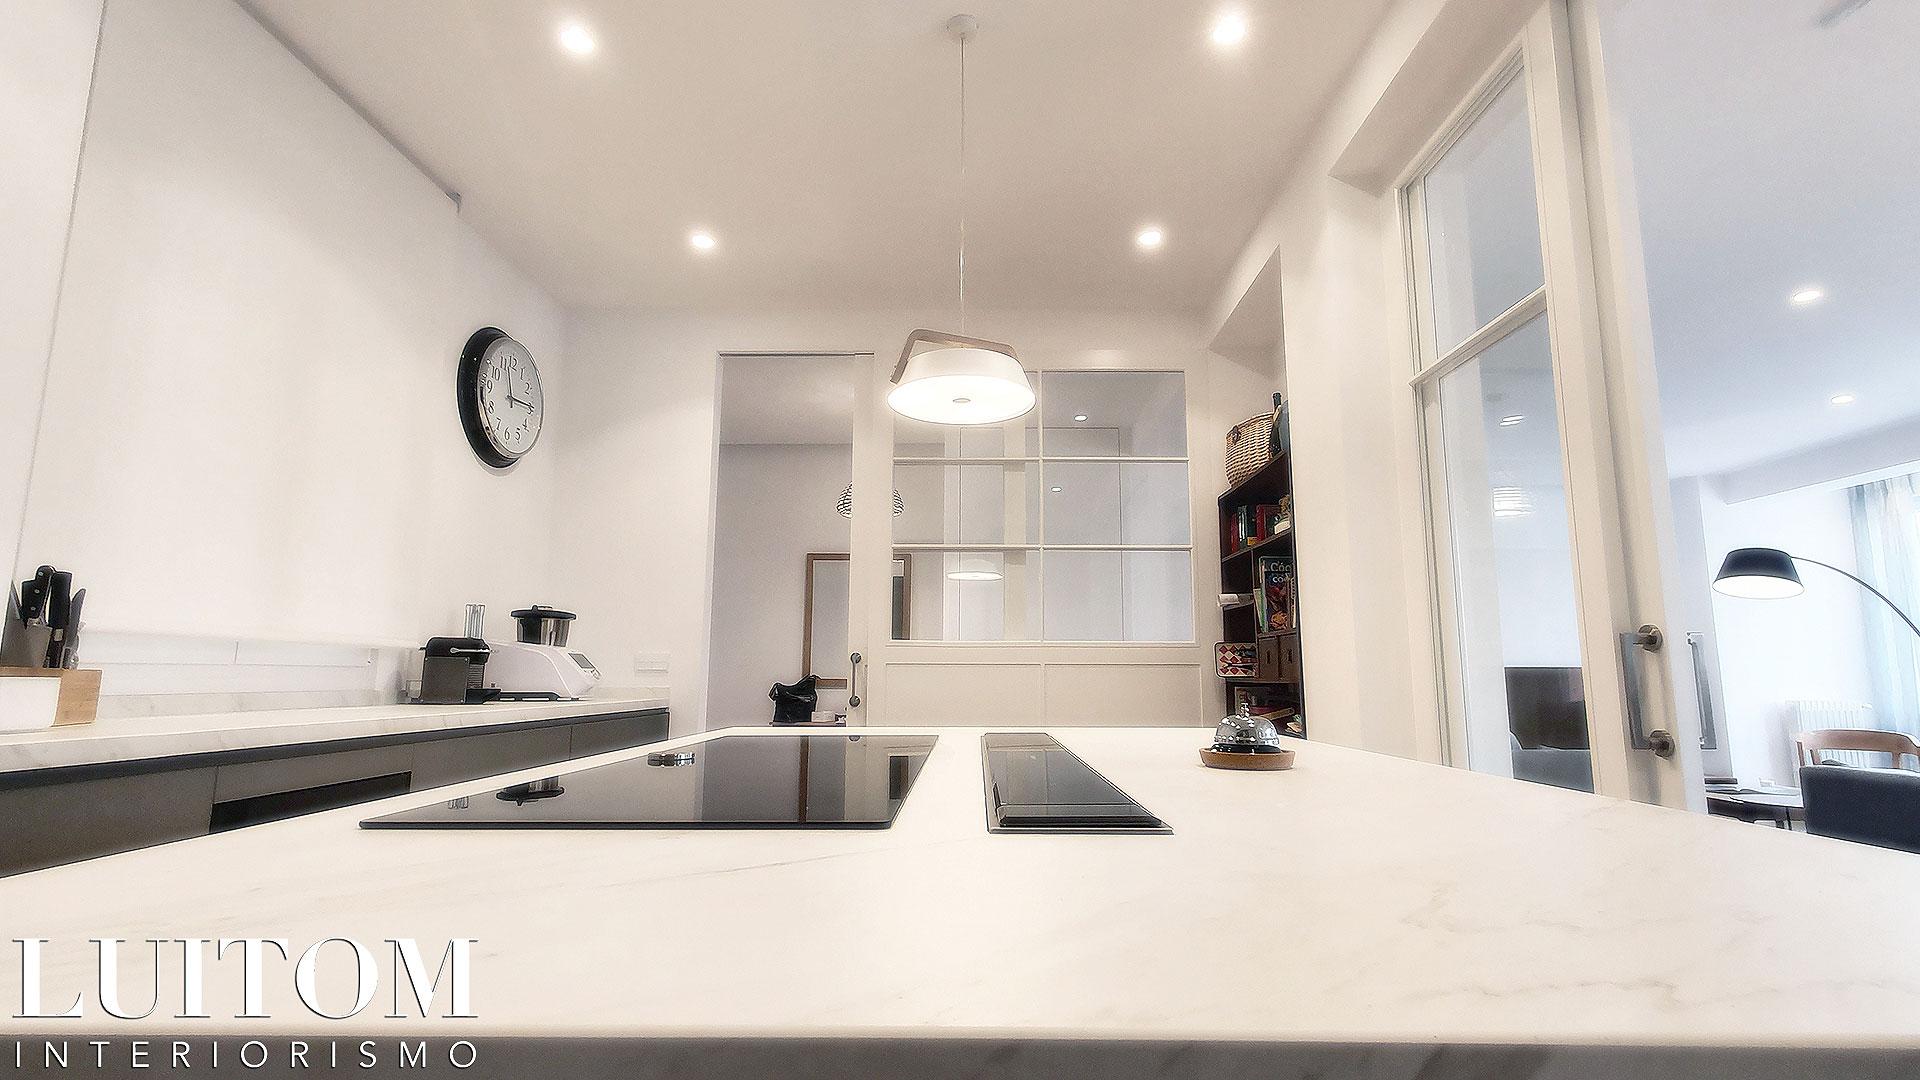 ideas-reformas-casas-lujo-interiorismo-decoracion-viviendas-luxury-home-living-kitchen-interior-design-17